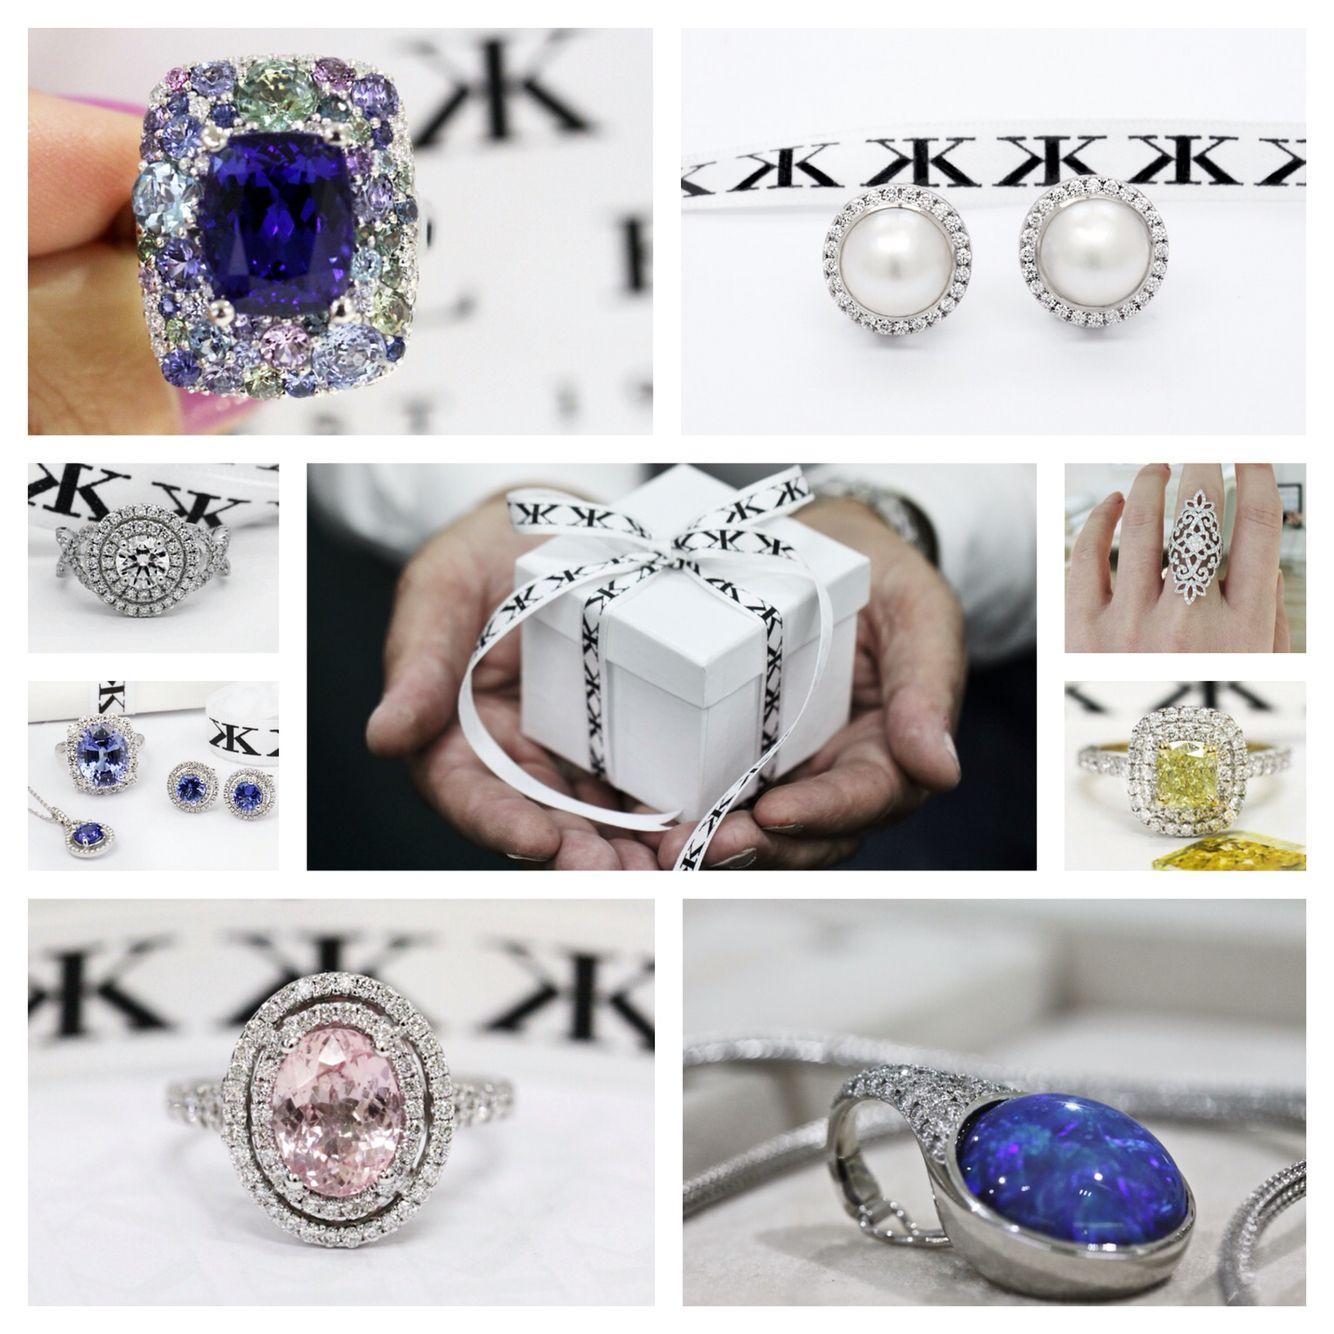 Custom made jewellery #kalfinjewellery #jewellersmelbourne #custommaderings #diamondringsmelbourne #engagementringsmelbourne #cbdjewellers #melbourne #weddingrings #diamondhalorings #artdeco #bluesapphire #yellowdiamonds #melbourne www.kalfin.com.au